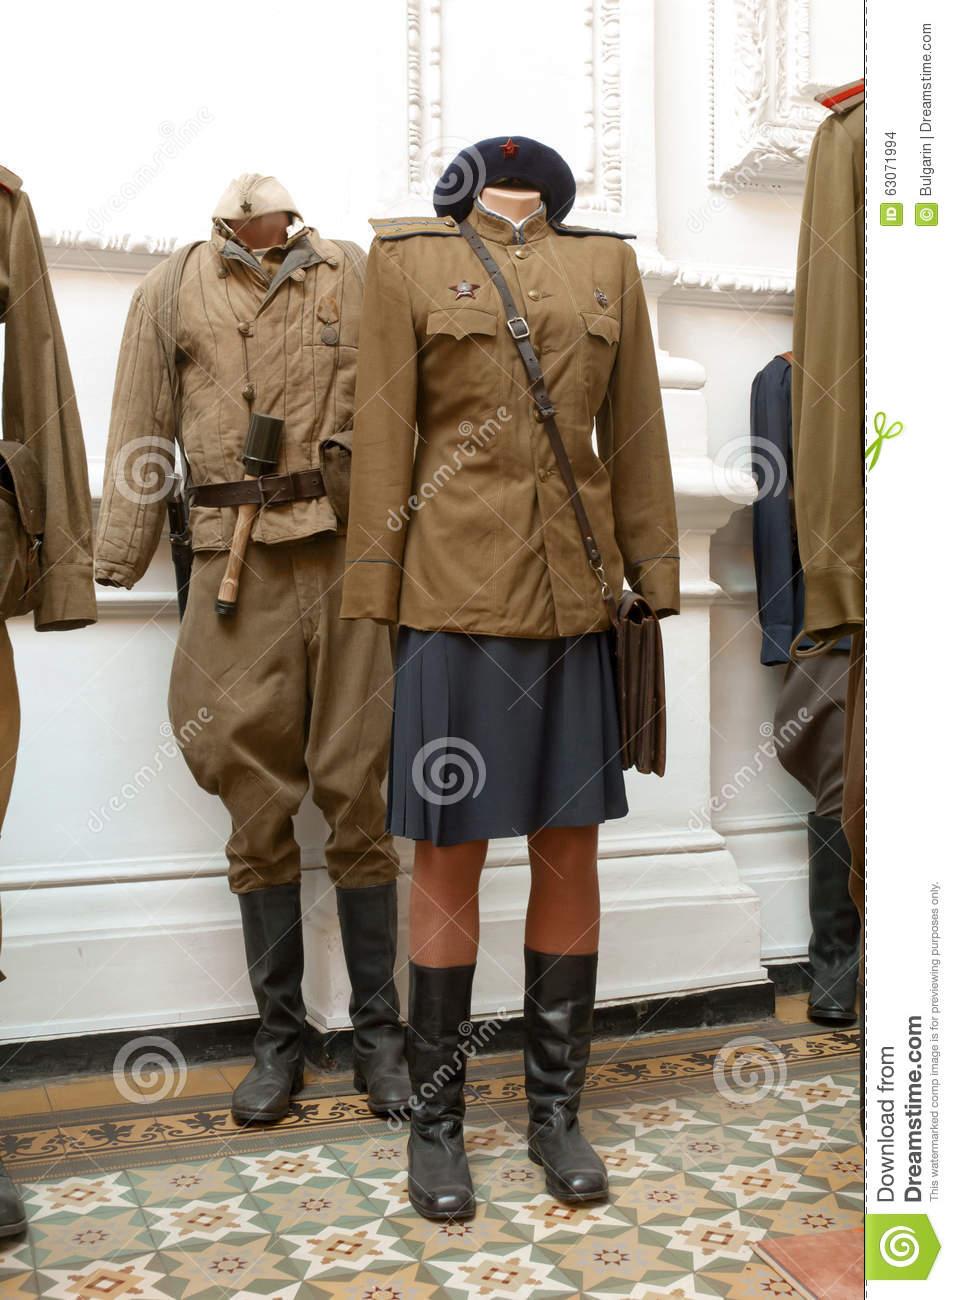 alertline - NEW PRODUCT: Alert Line Boundary Game Model: 1/6 WWII Soviet Army Female Soldier NKVD, Soviet Army Female Medical Soldier #AL100031/32 Price announced Female11